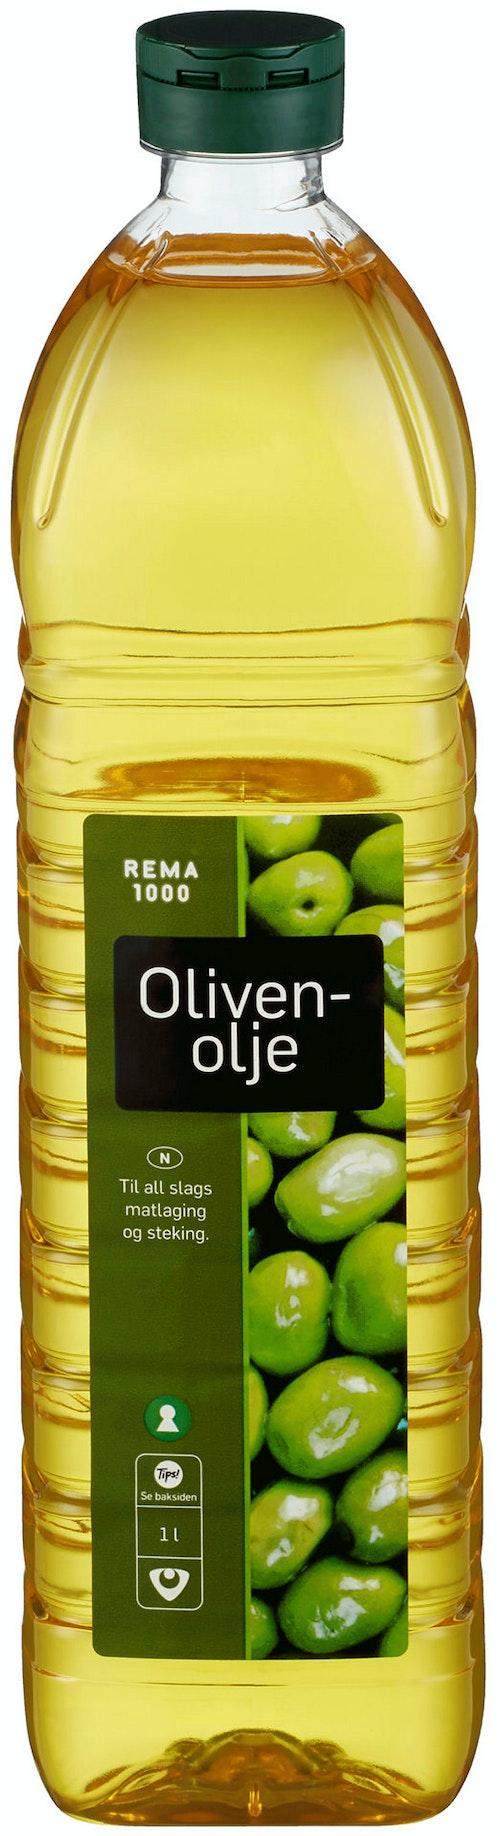 REMA 1000 Olivenolje 1 l